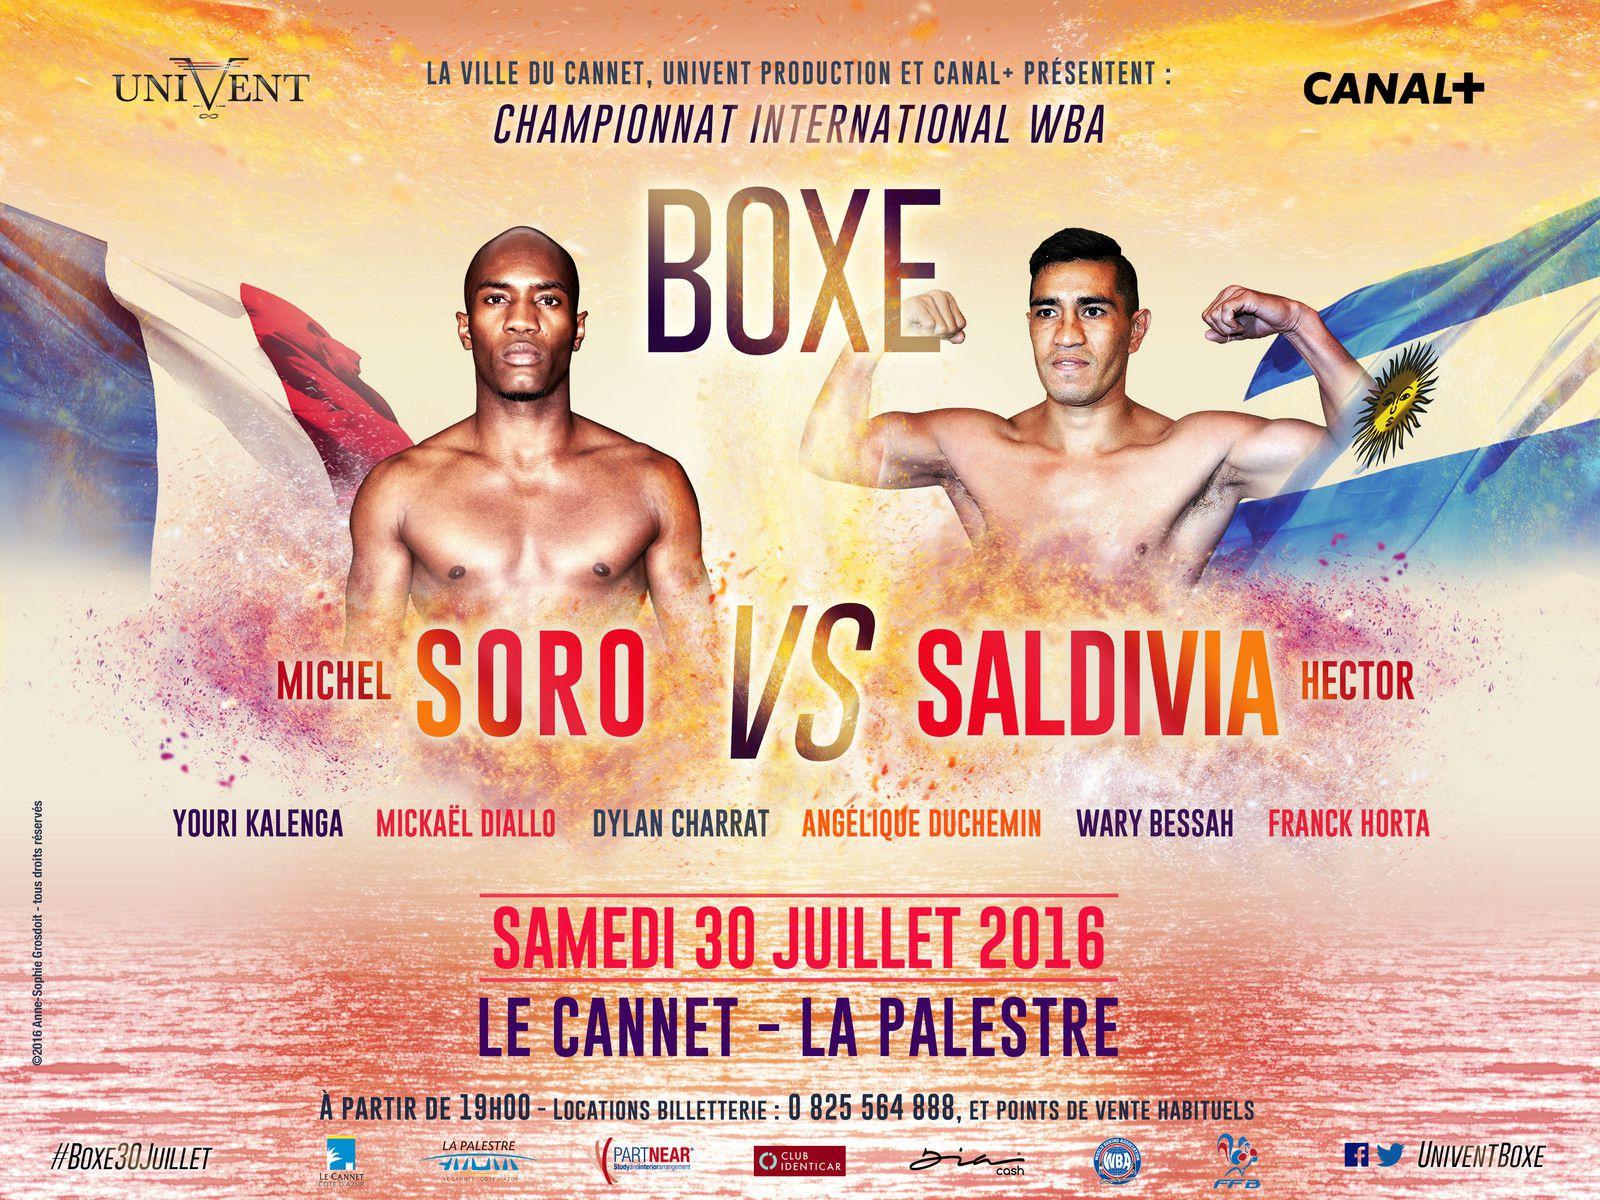 Boxe - Combat Michel Soro/Hector Saldivia à suivre ce samedi sur Canal+